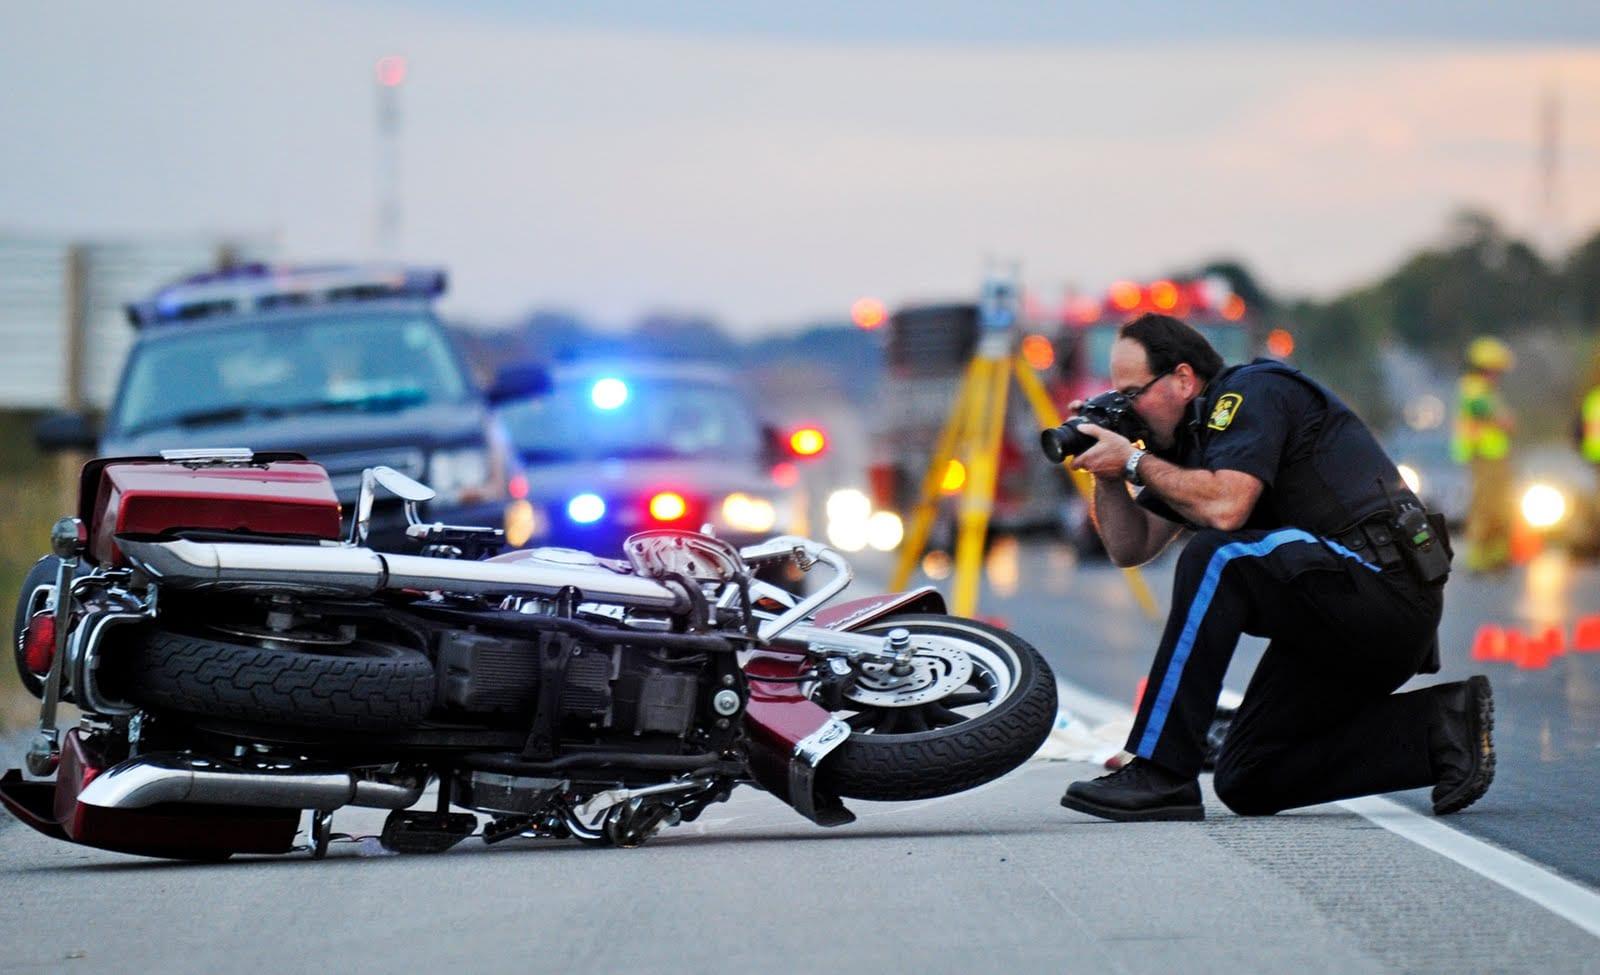 Motorcycle Fatality Demographics